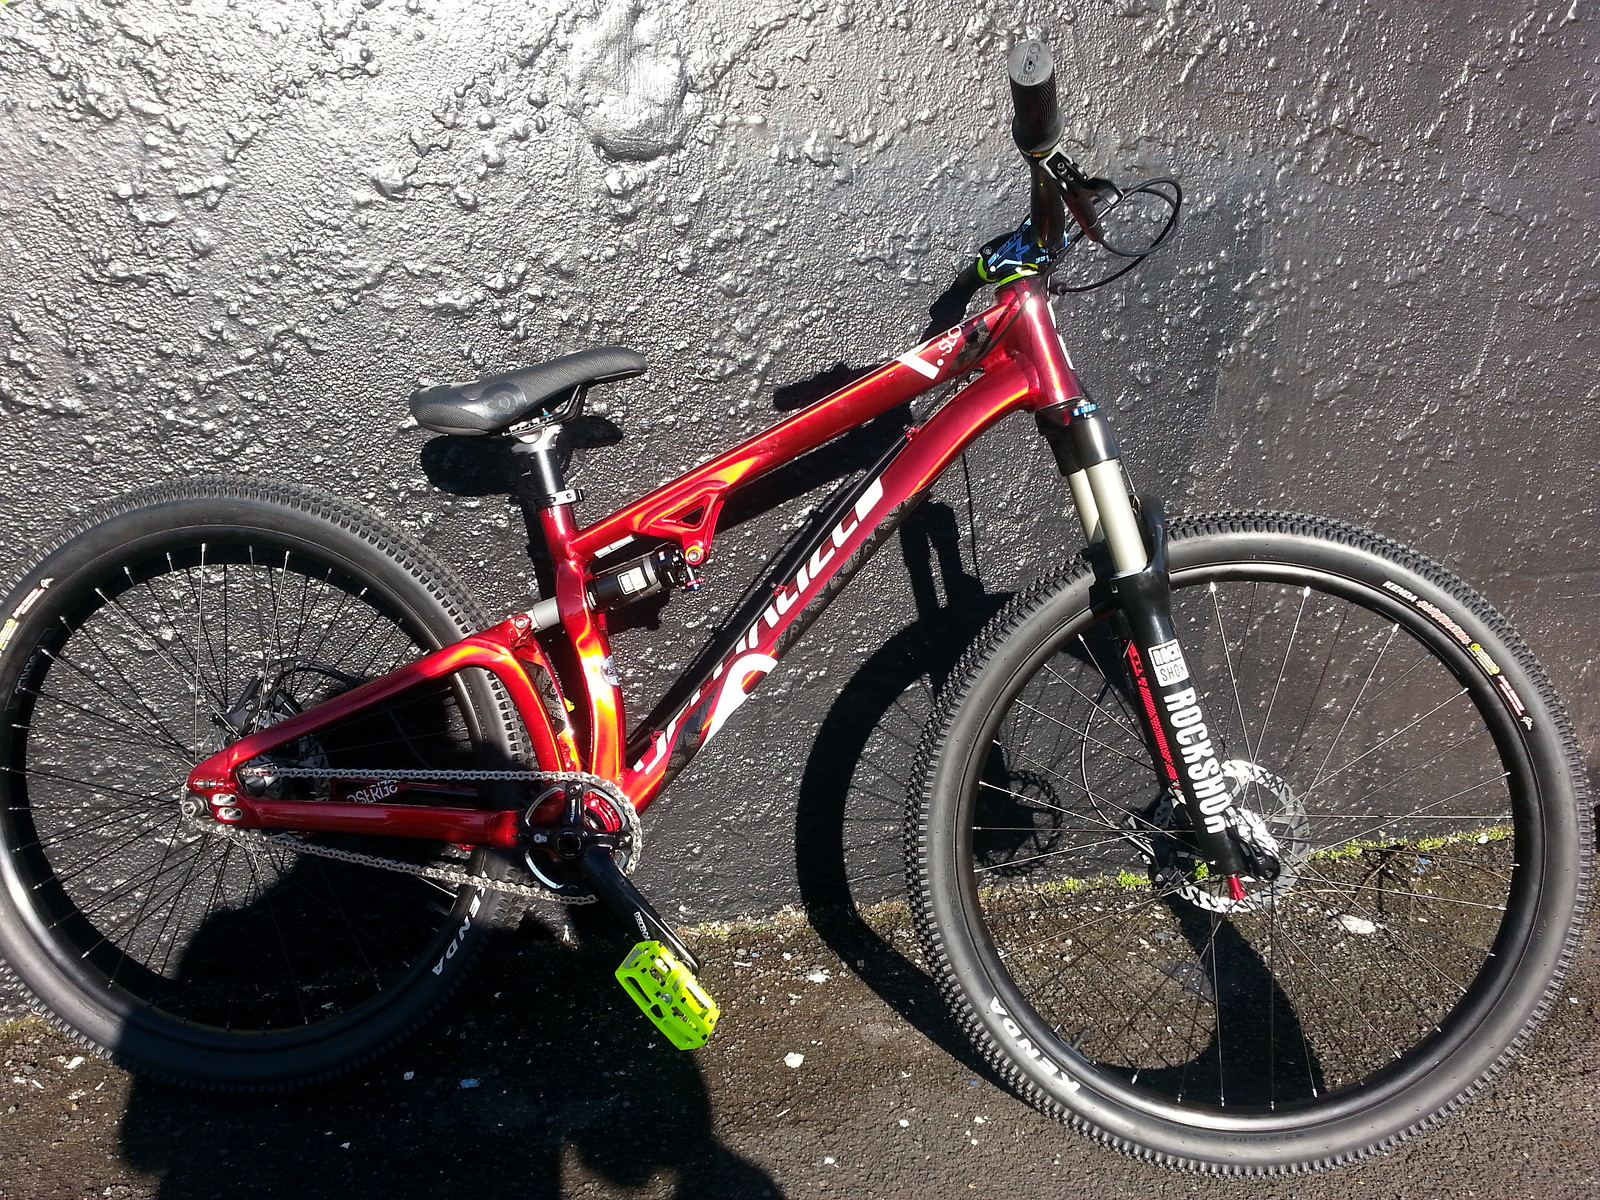 best bike i have ridden ever so far